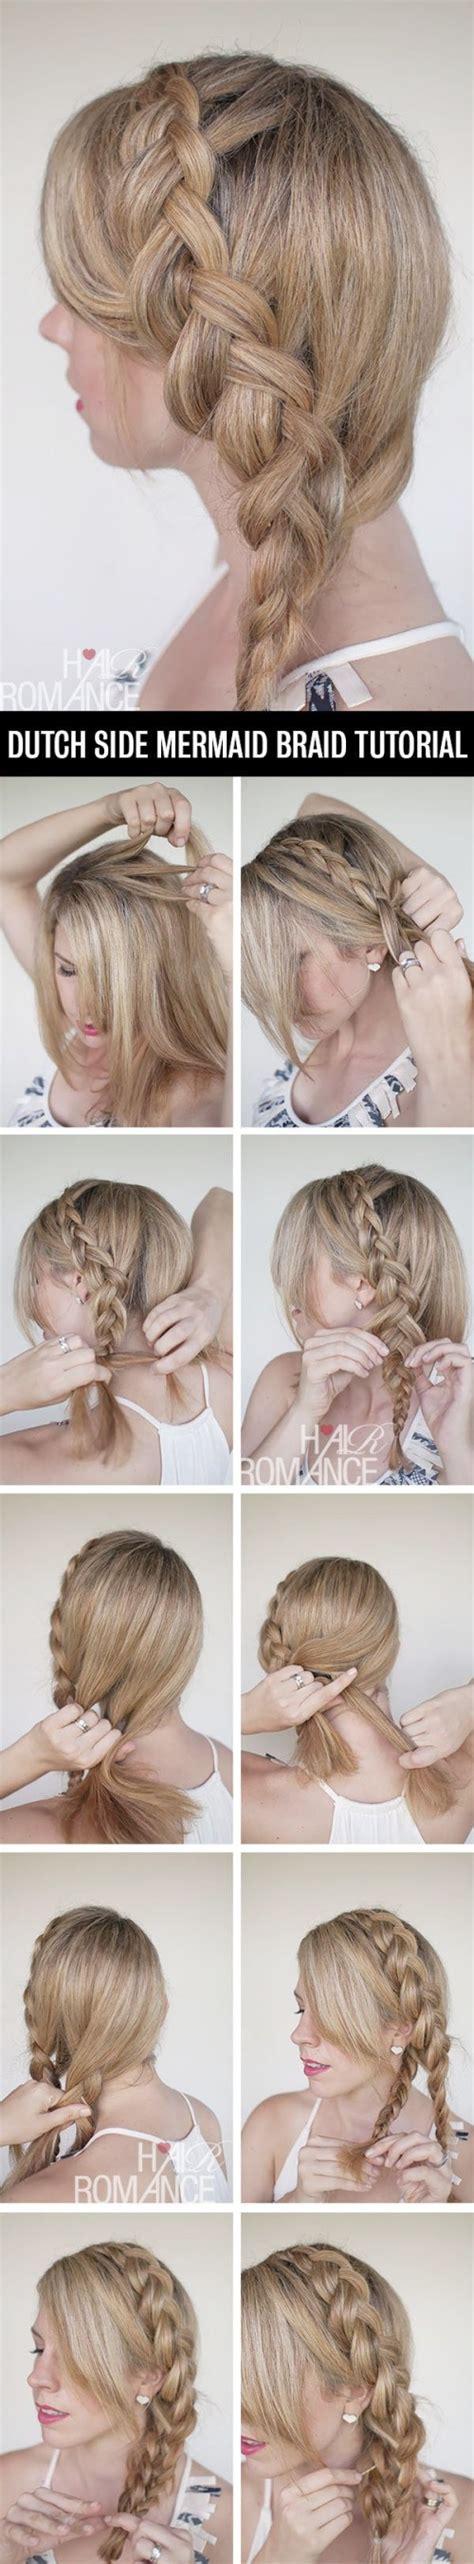 the ultimate mermaid braid step by step instructions 12 perfect braid hair tutorials hairstyles 2017 trendy